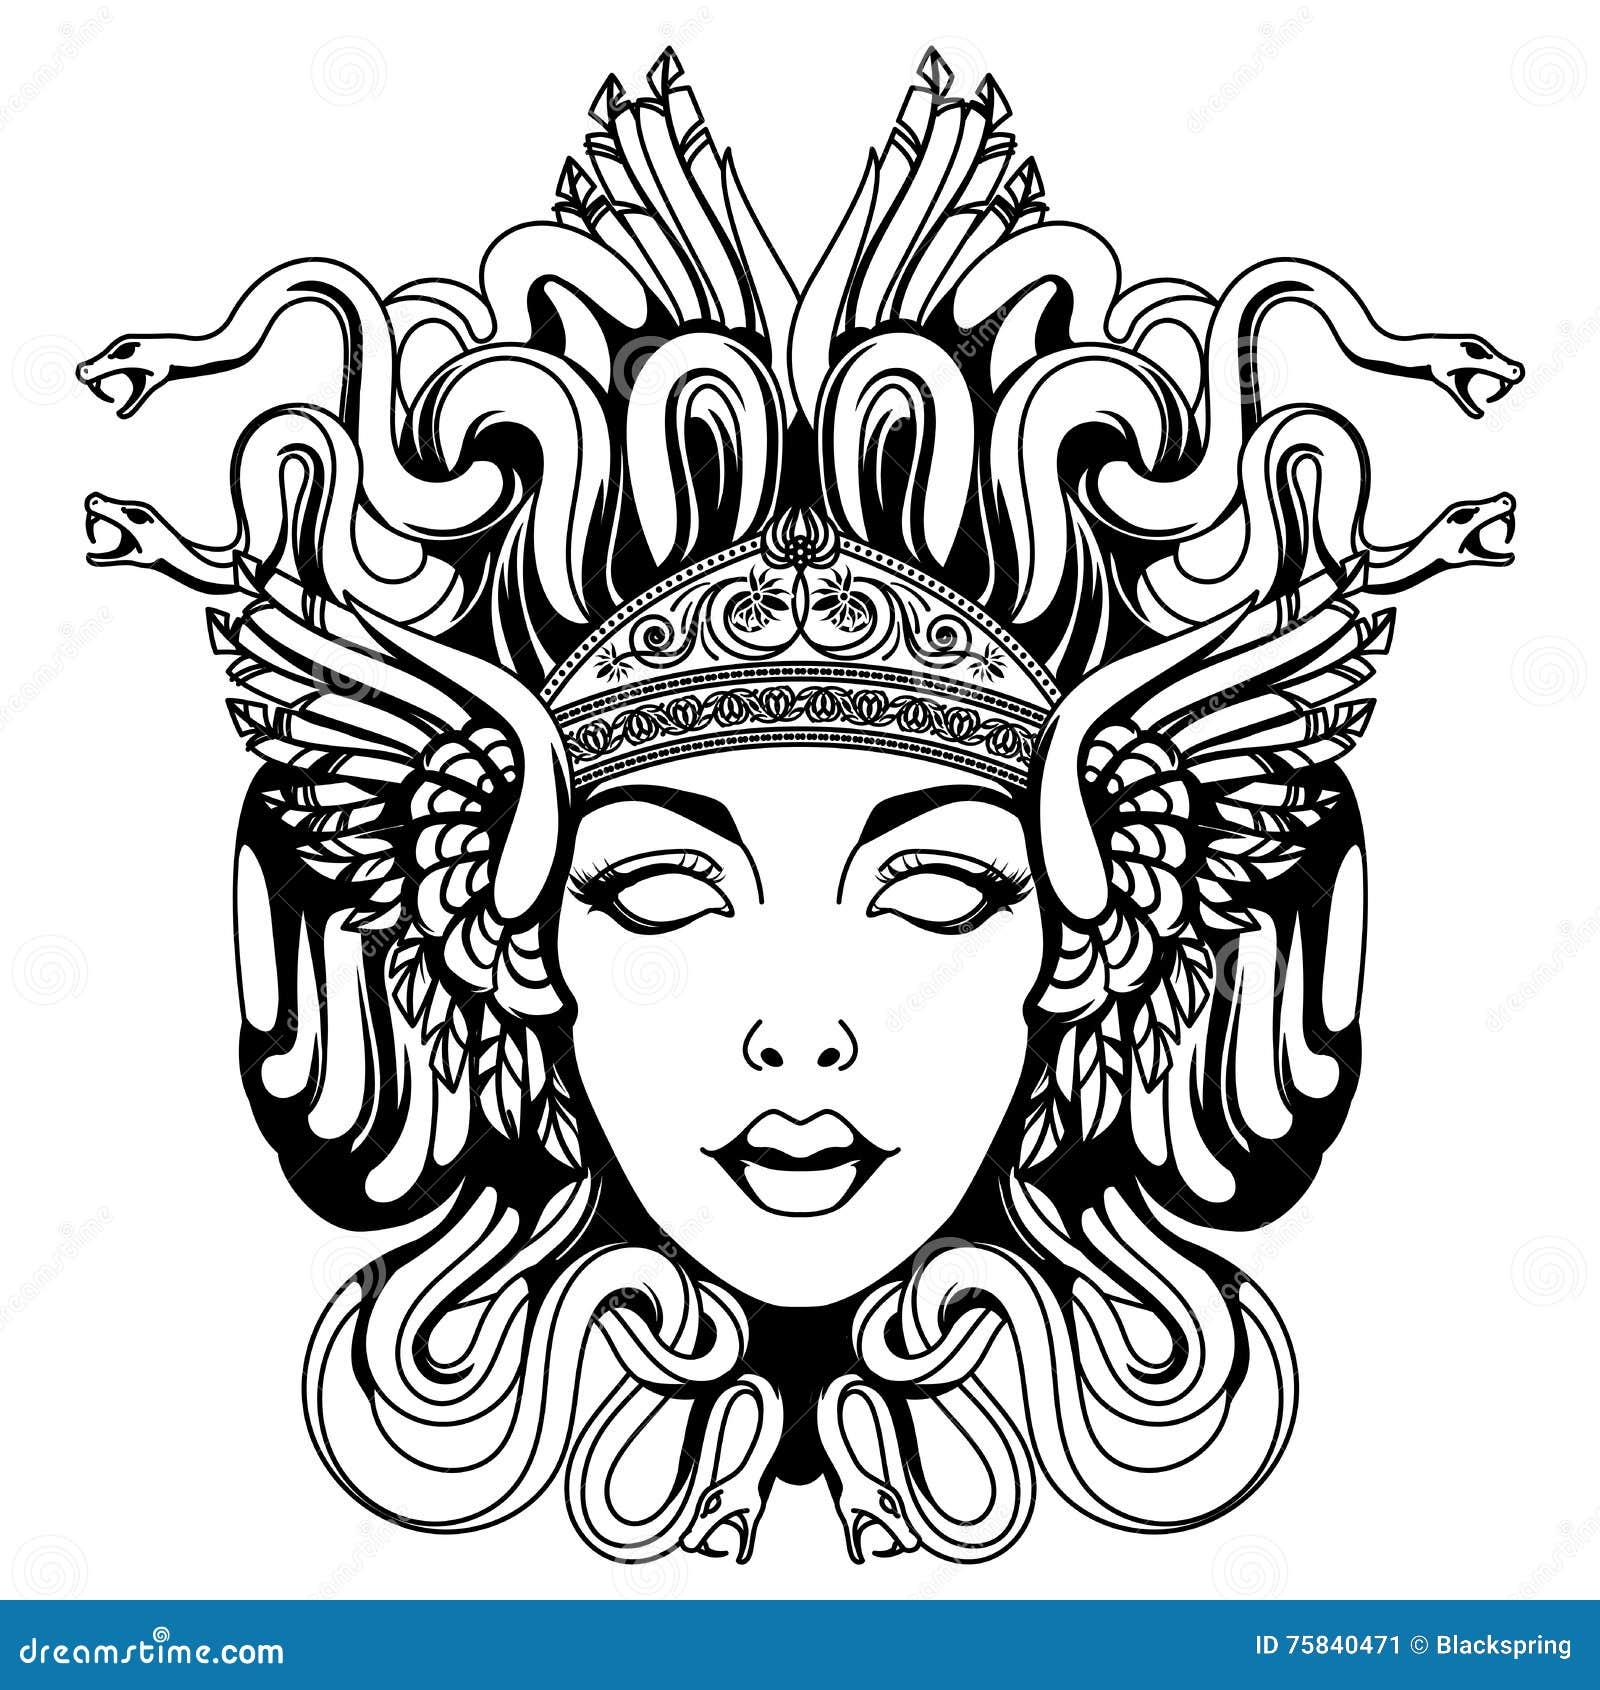 Medusa gorgon portrait stock vector image 75840471 for Medusa da colorare